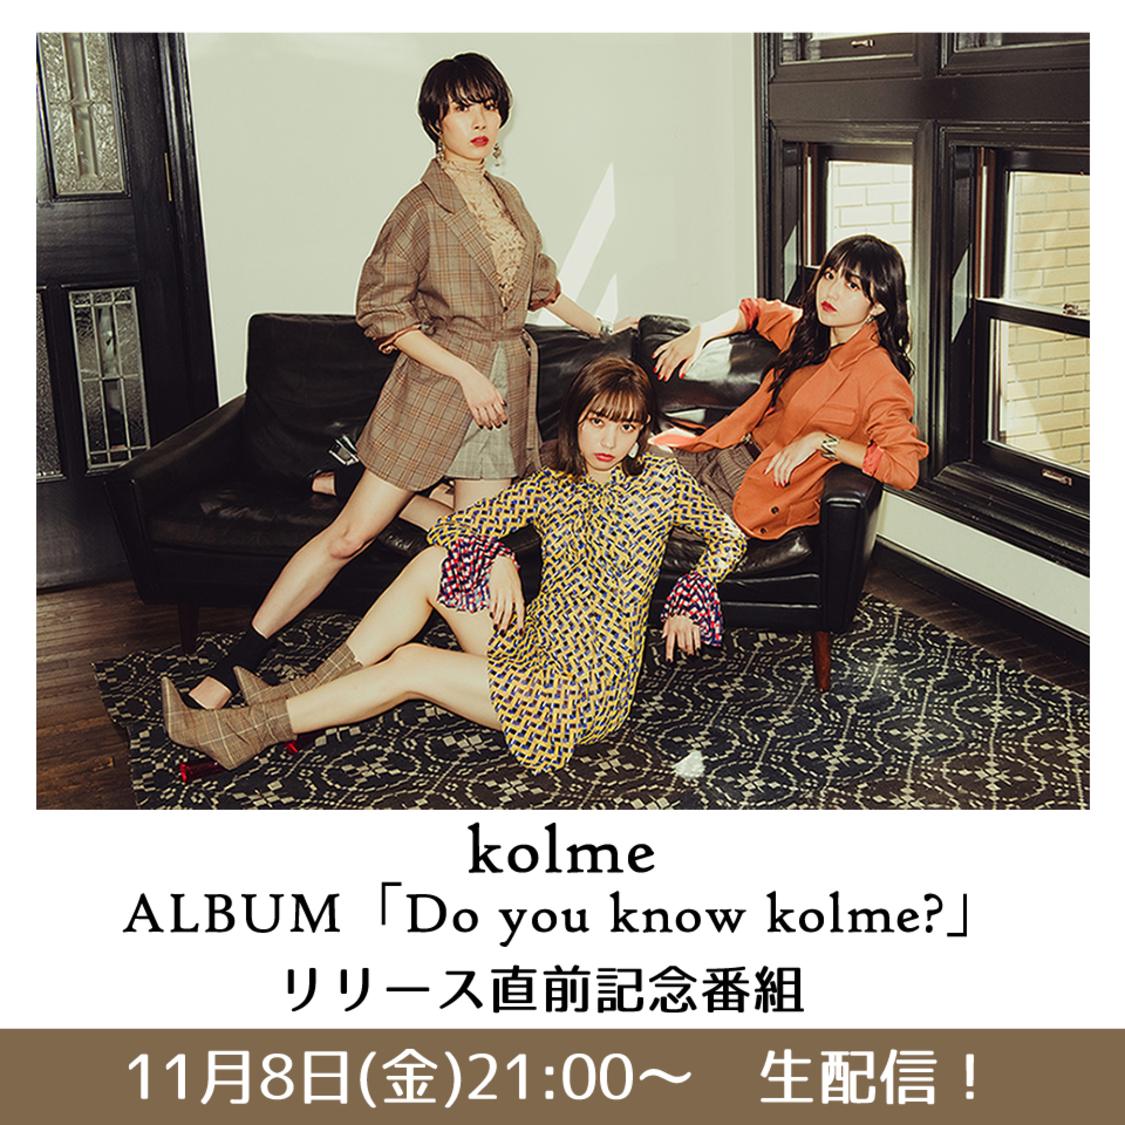 kolme、アルバム解説&初のスタジオ生歌唱をLINE LIVEで生配信!